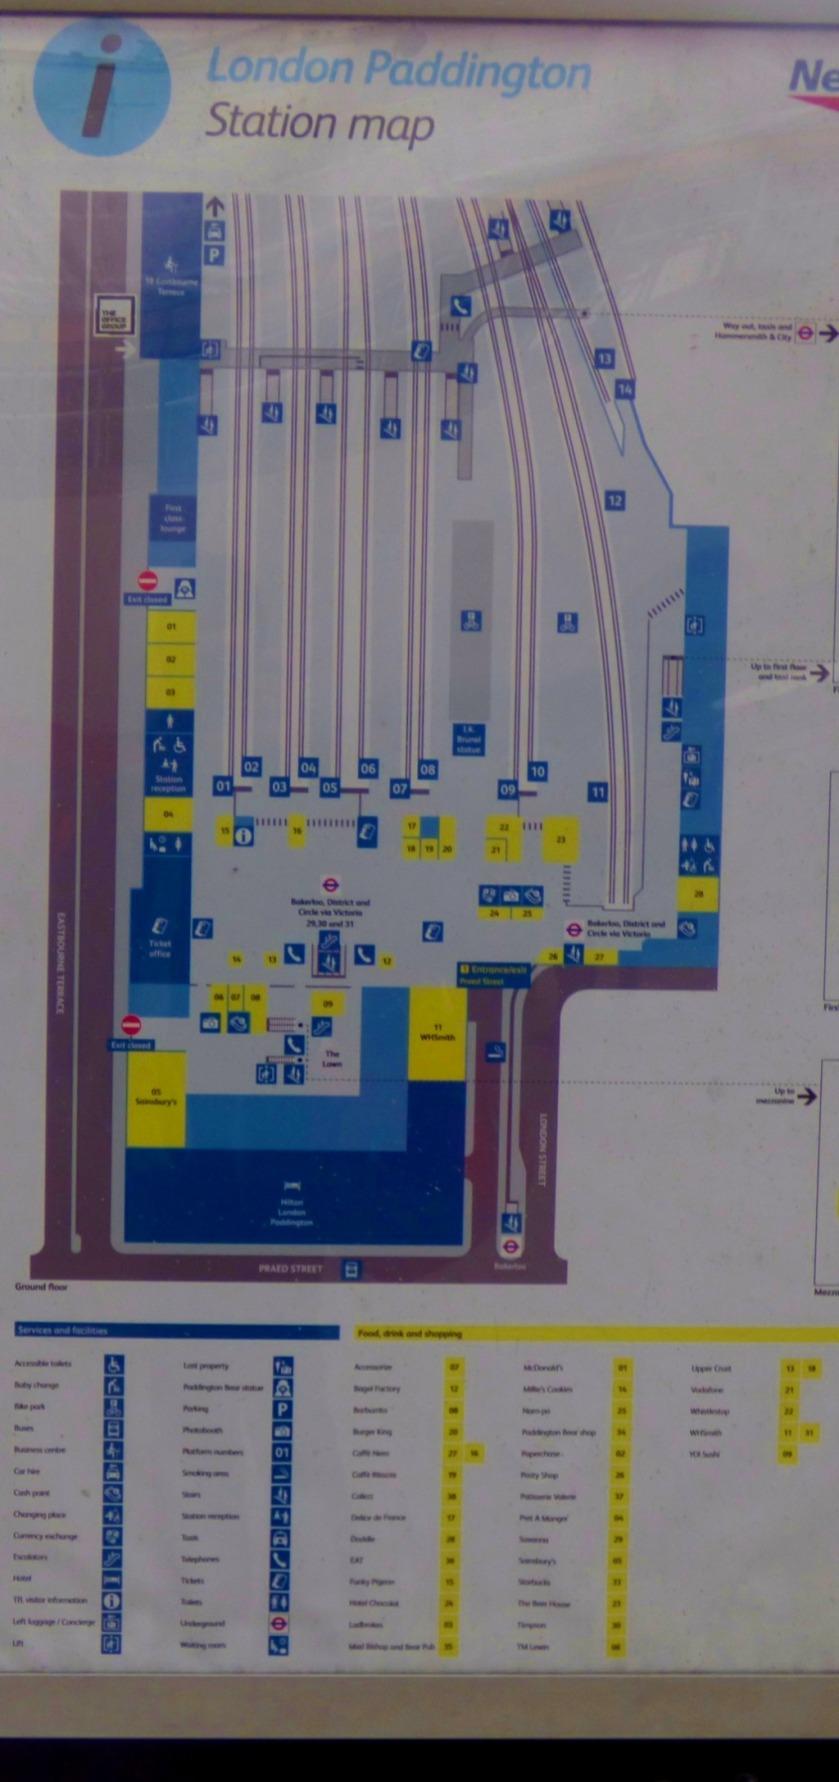 Station plan, paddington